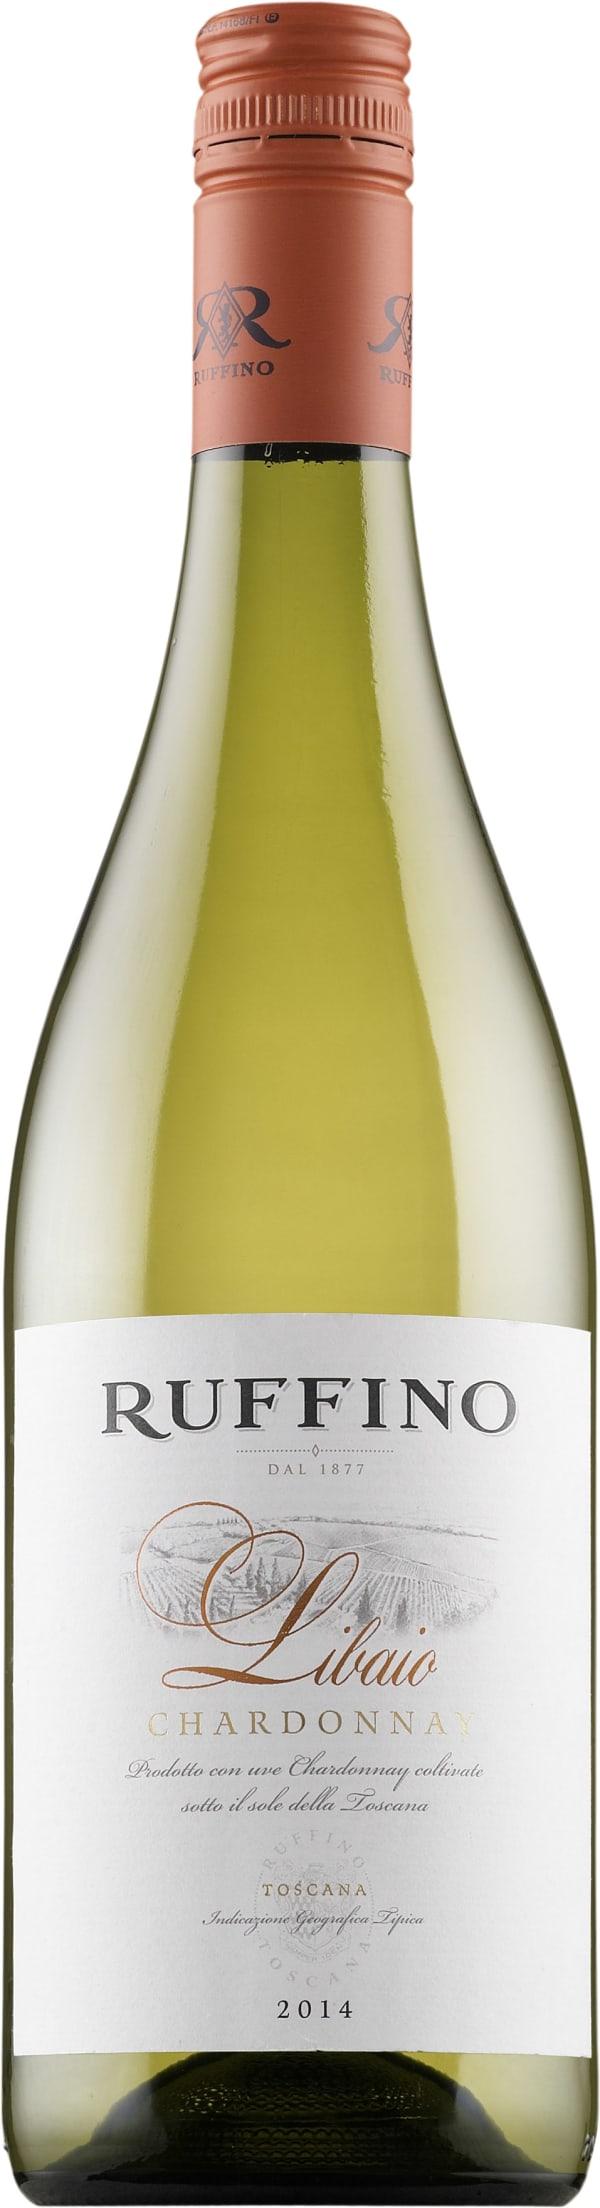 Ruffino Libaio Chardonnay 2016